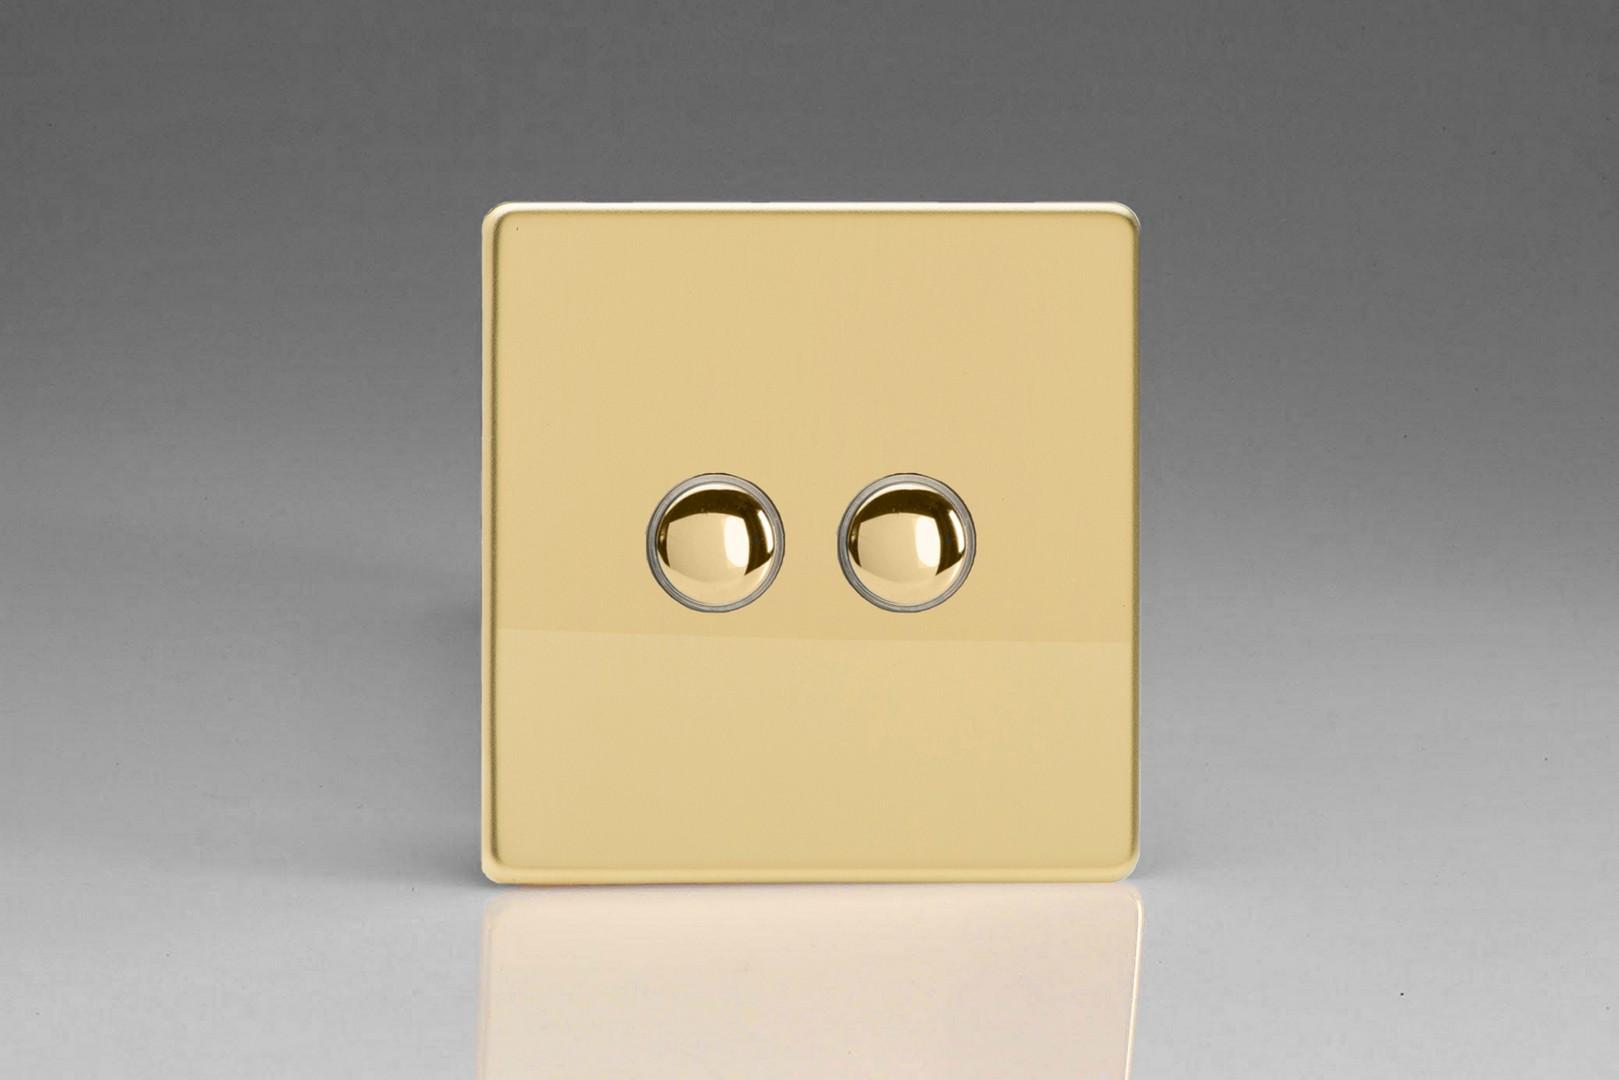 Flat Plate Screwless Polished Brass 2